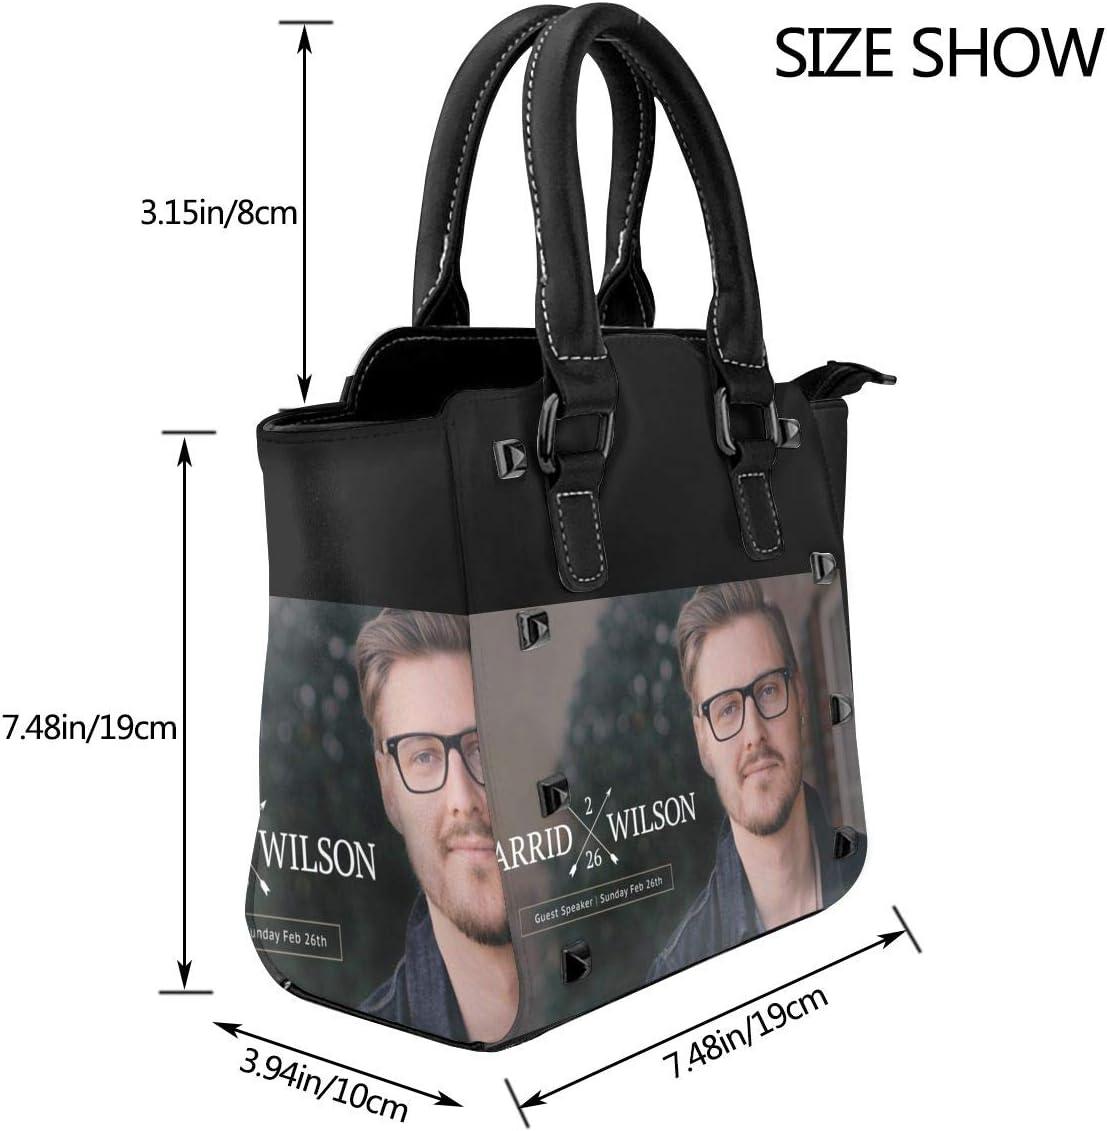 Lsbury Jarrid Wilson Rivet PU Leather Tote Bag Shoulder Bag